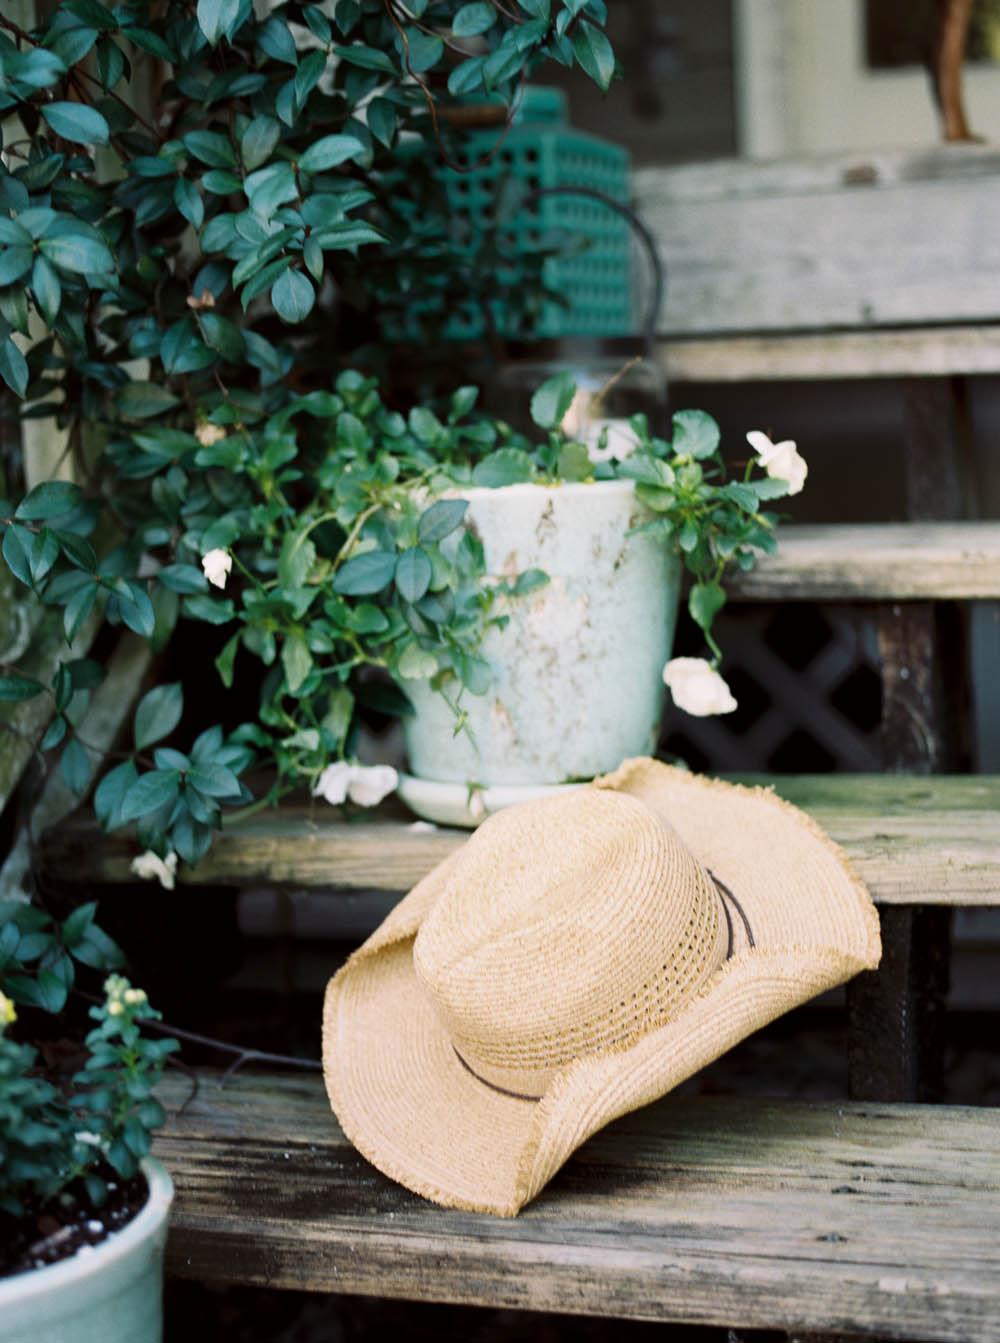 web grayton beach 30a florist lifestyle photography day in the life editorial film ©2016abigailbobophotography-8.jpg